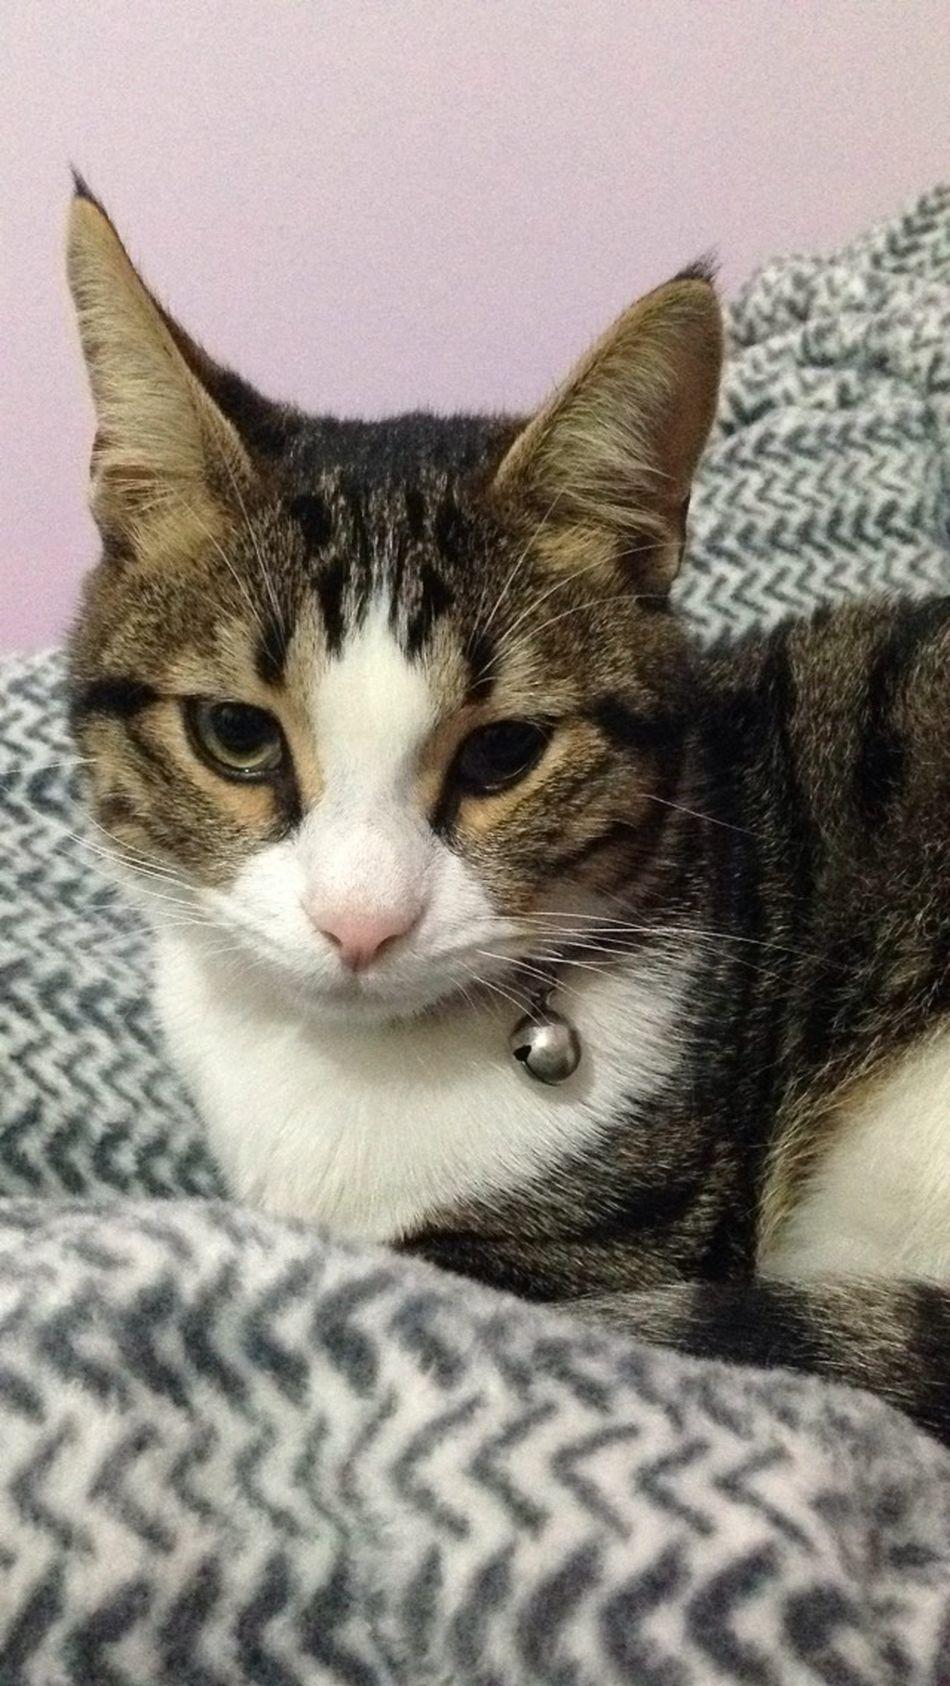 I'll kill u! Evileye Cat Angry Cat Getoutofmyroom